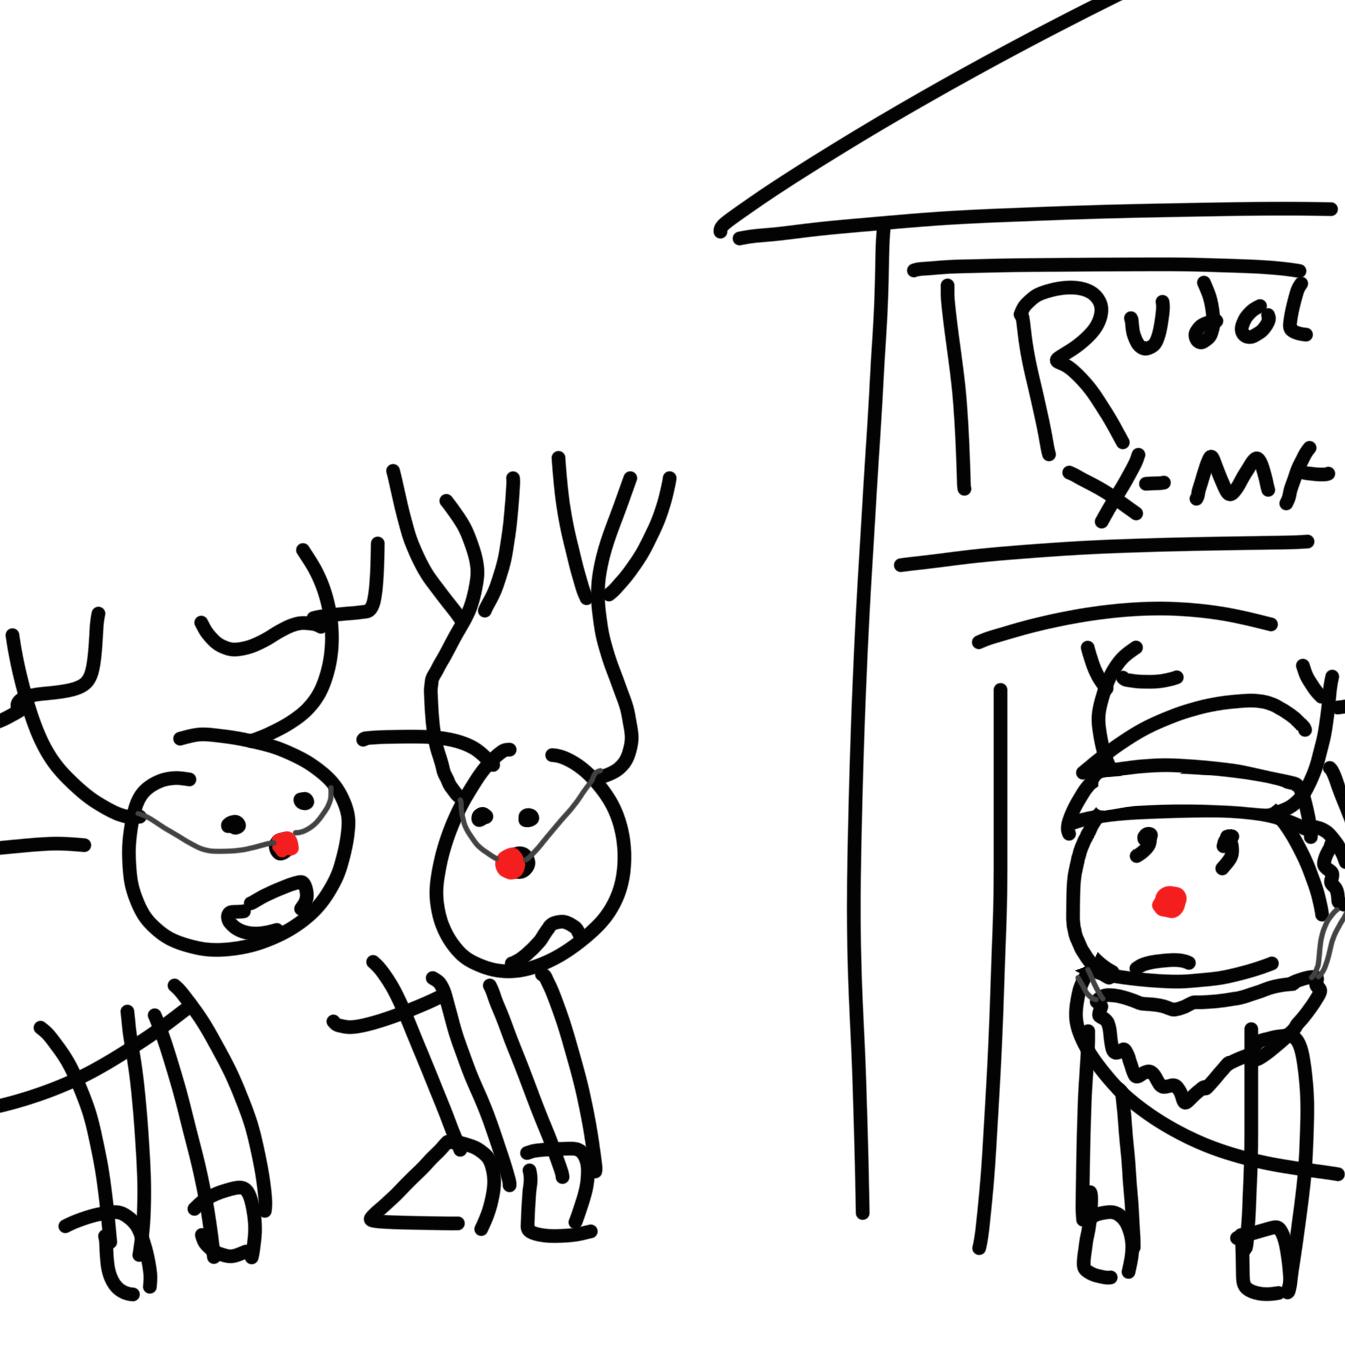 Rudolph Problems.